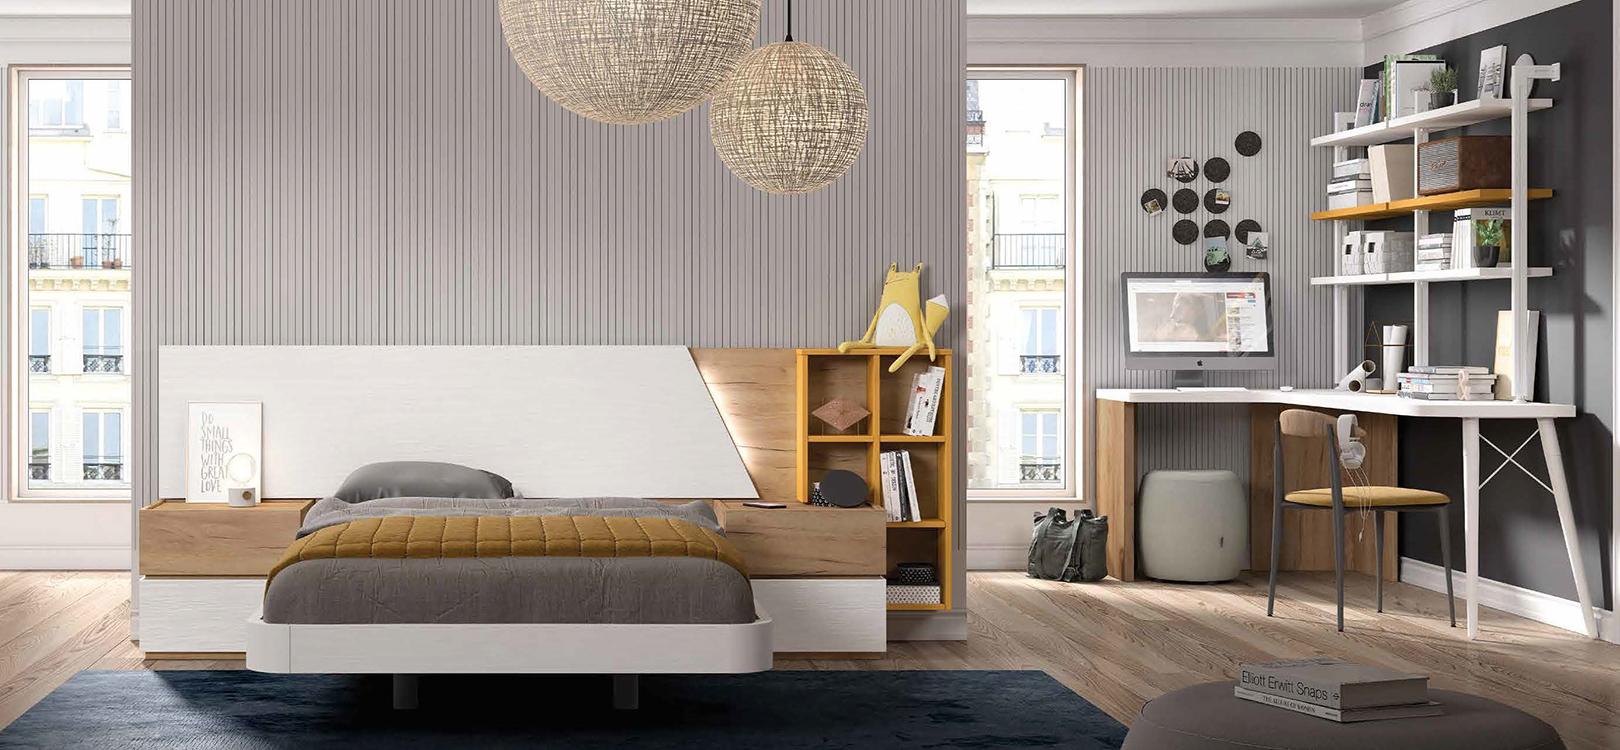 Dormitorios individuales color caoba for Muebles modulares juveniles